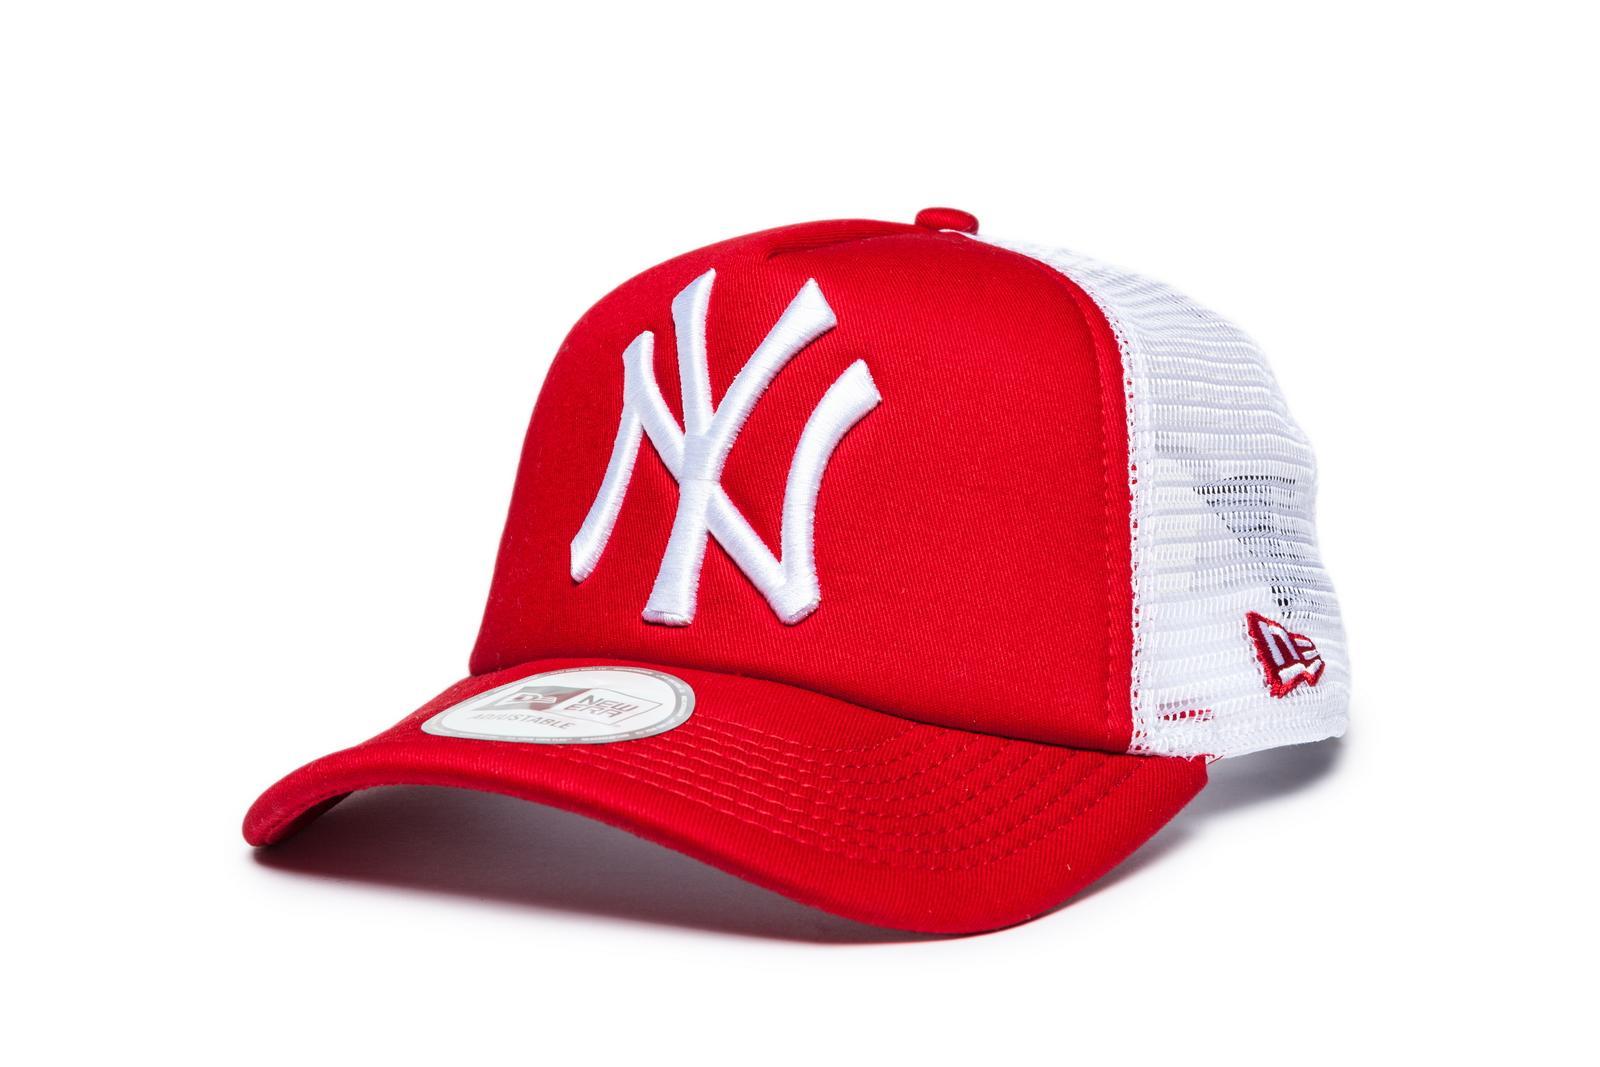 5161fa0d7 ŠILTOVKY NEW ERA | Šiltovka New Era Trucker New York Yenkees Red ...